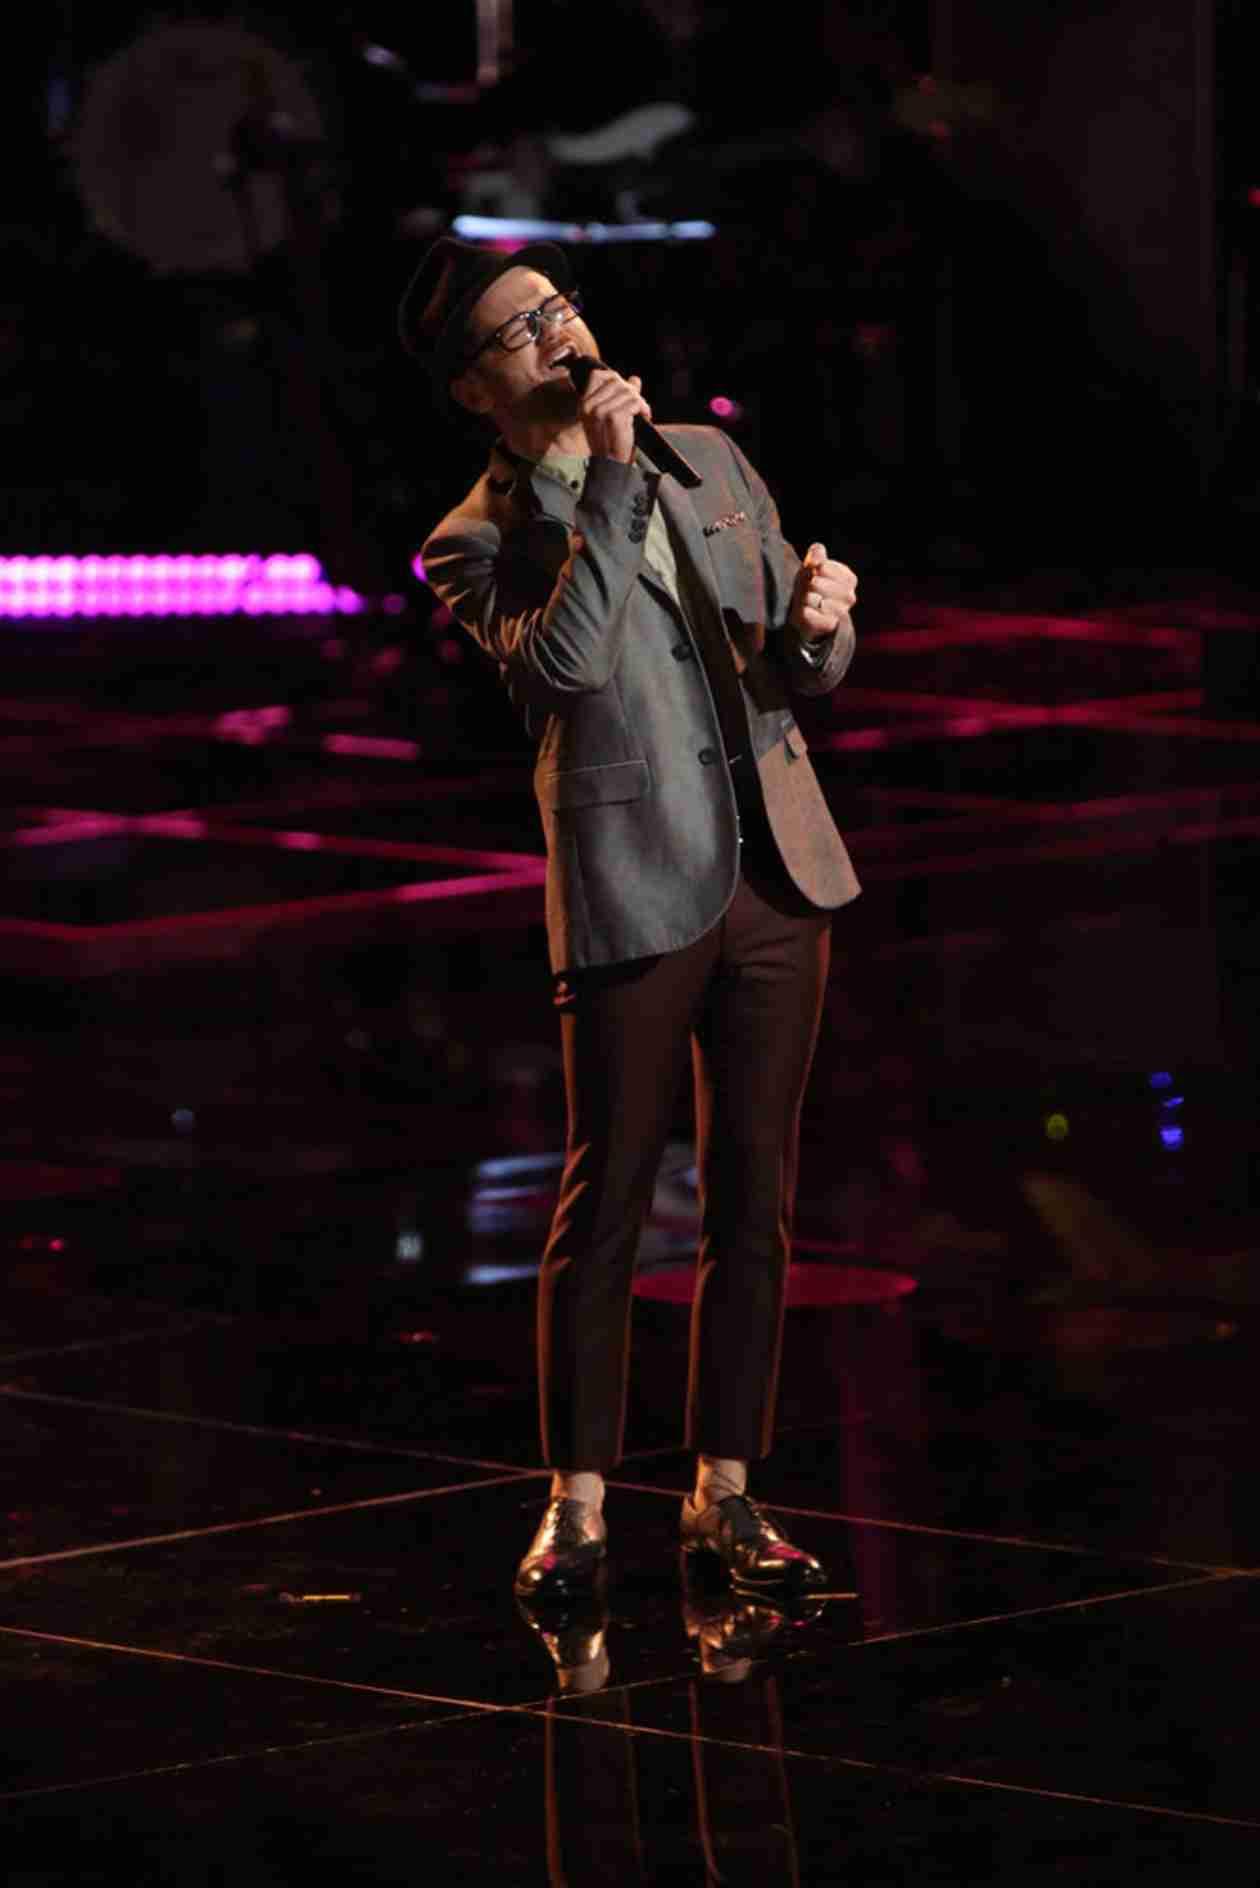 Watch Josh Kaufman Sing on The Voice 2014 Playoffs, April 14, 2014 (VIDEO)